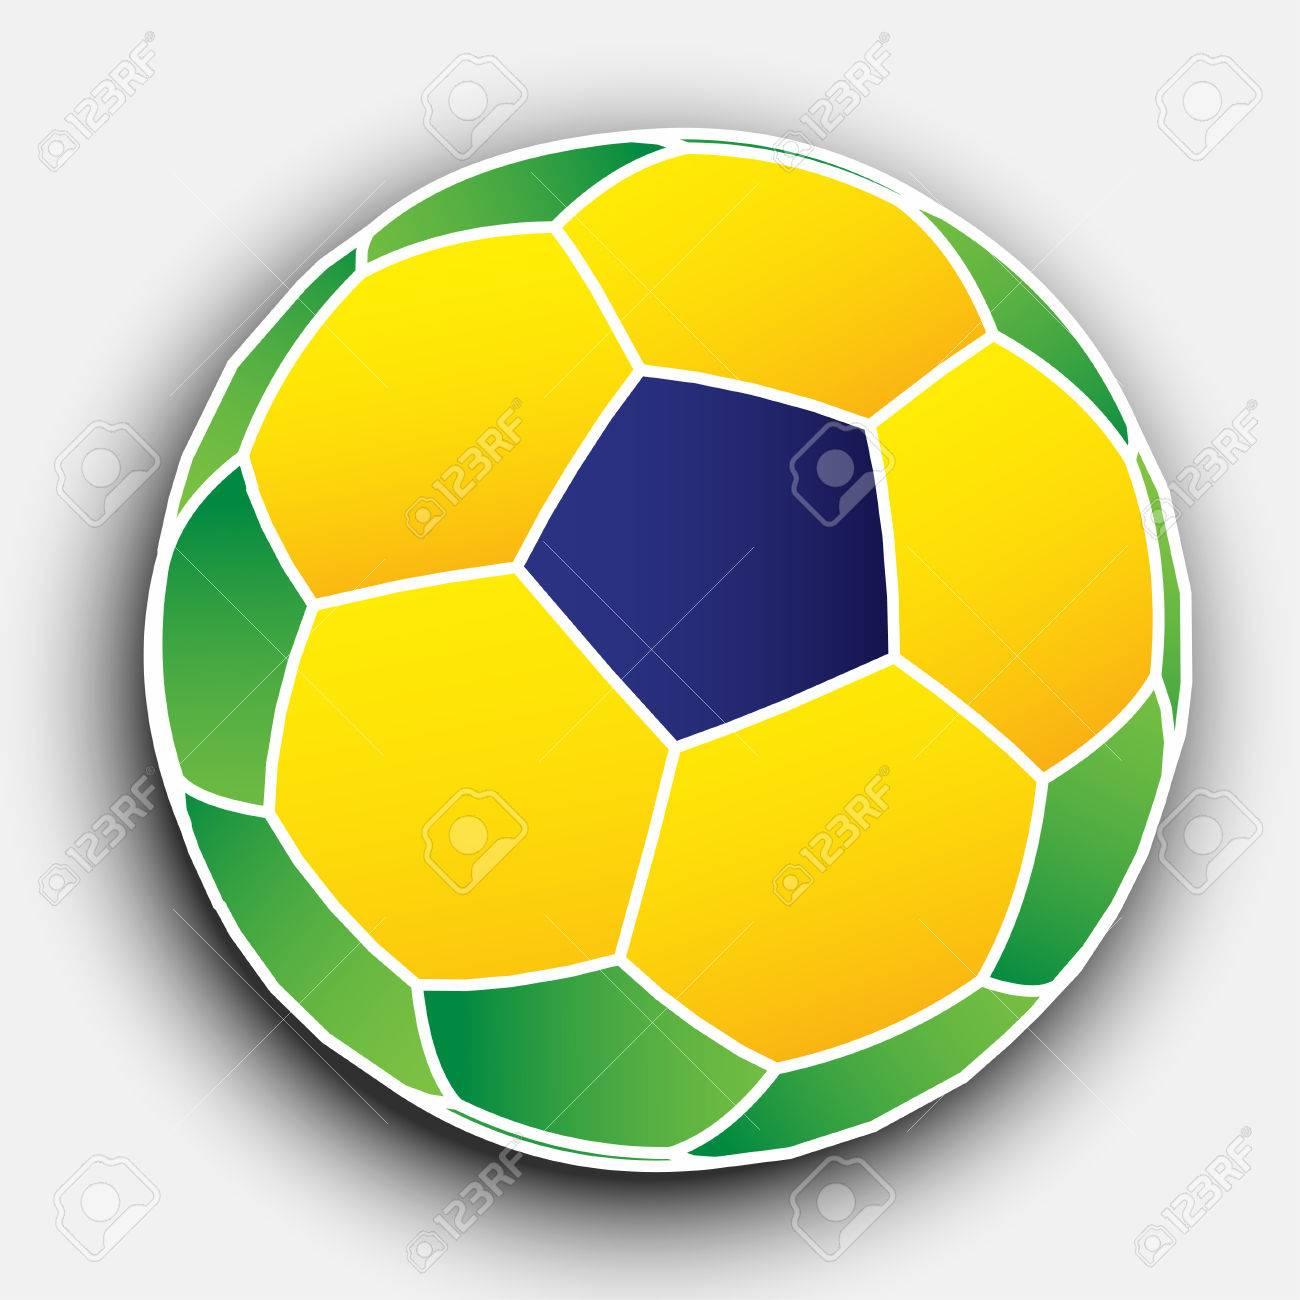 Abstract Soccer Ball EPS10 Vector - 51785680